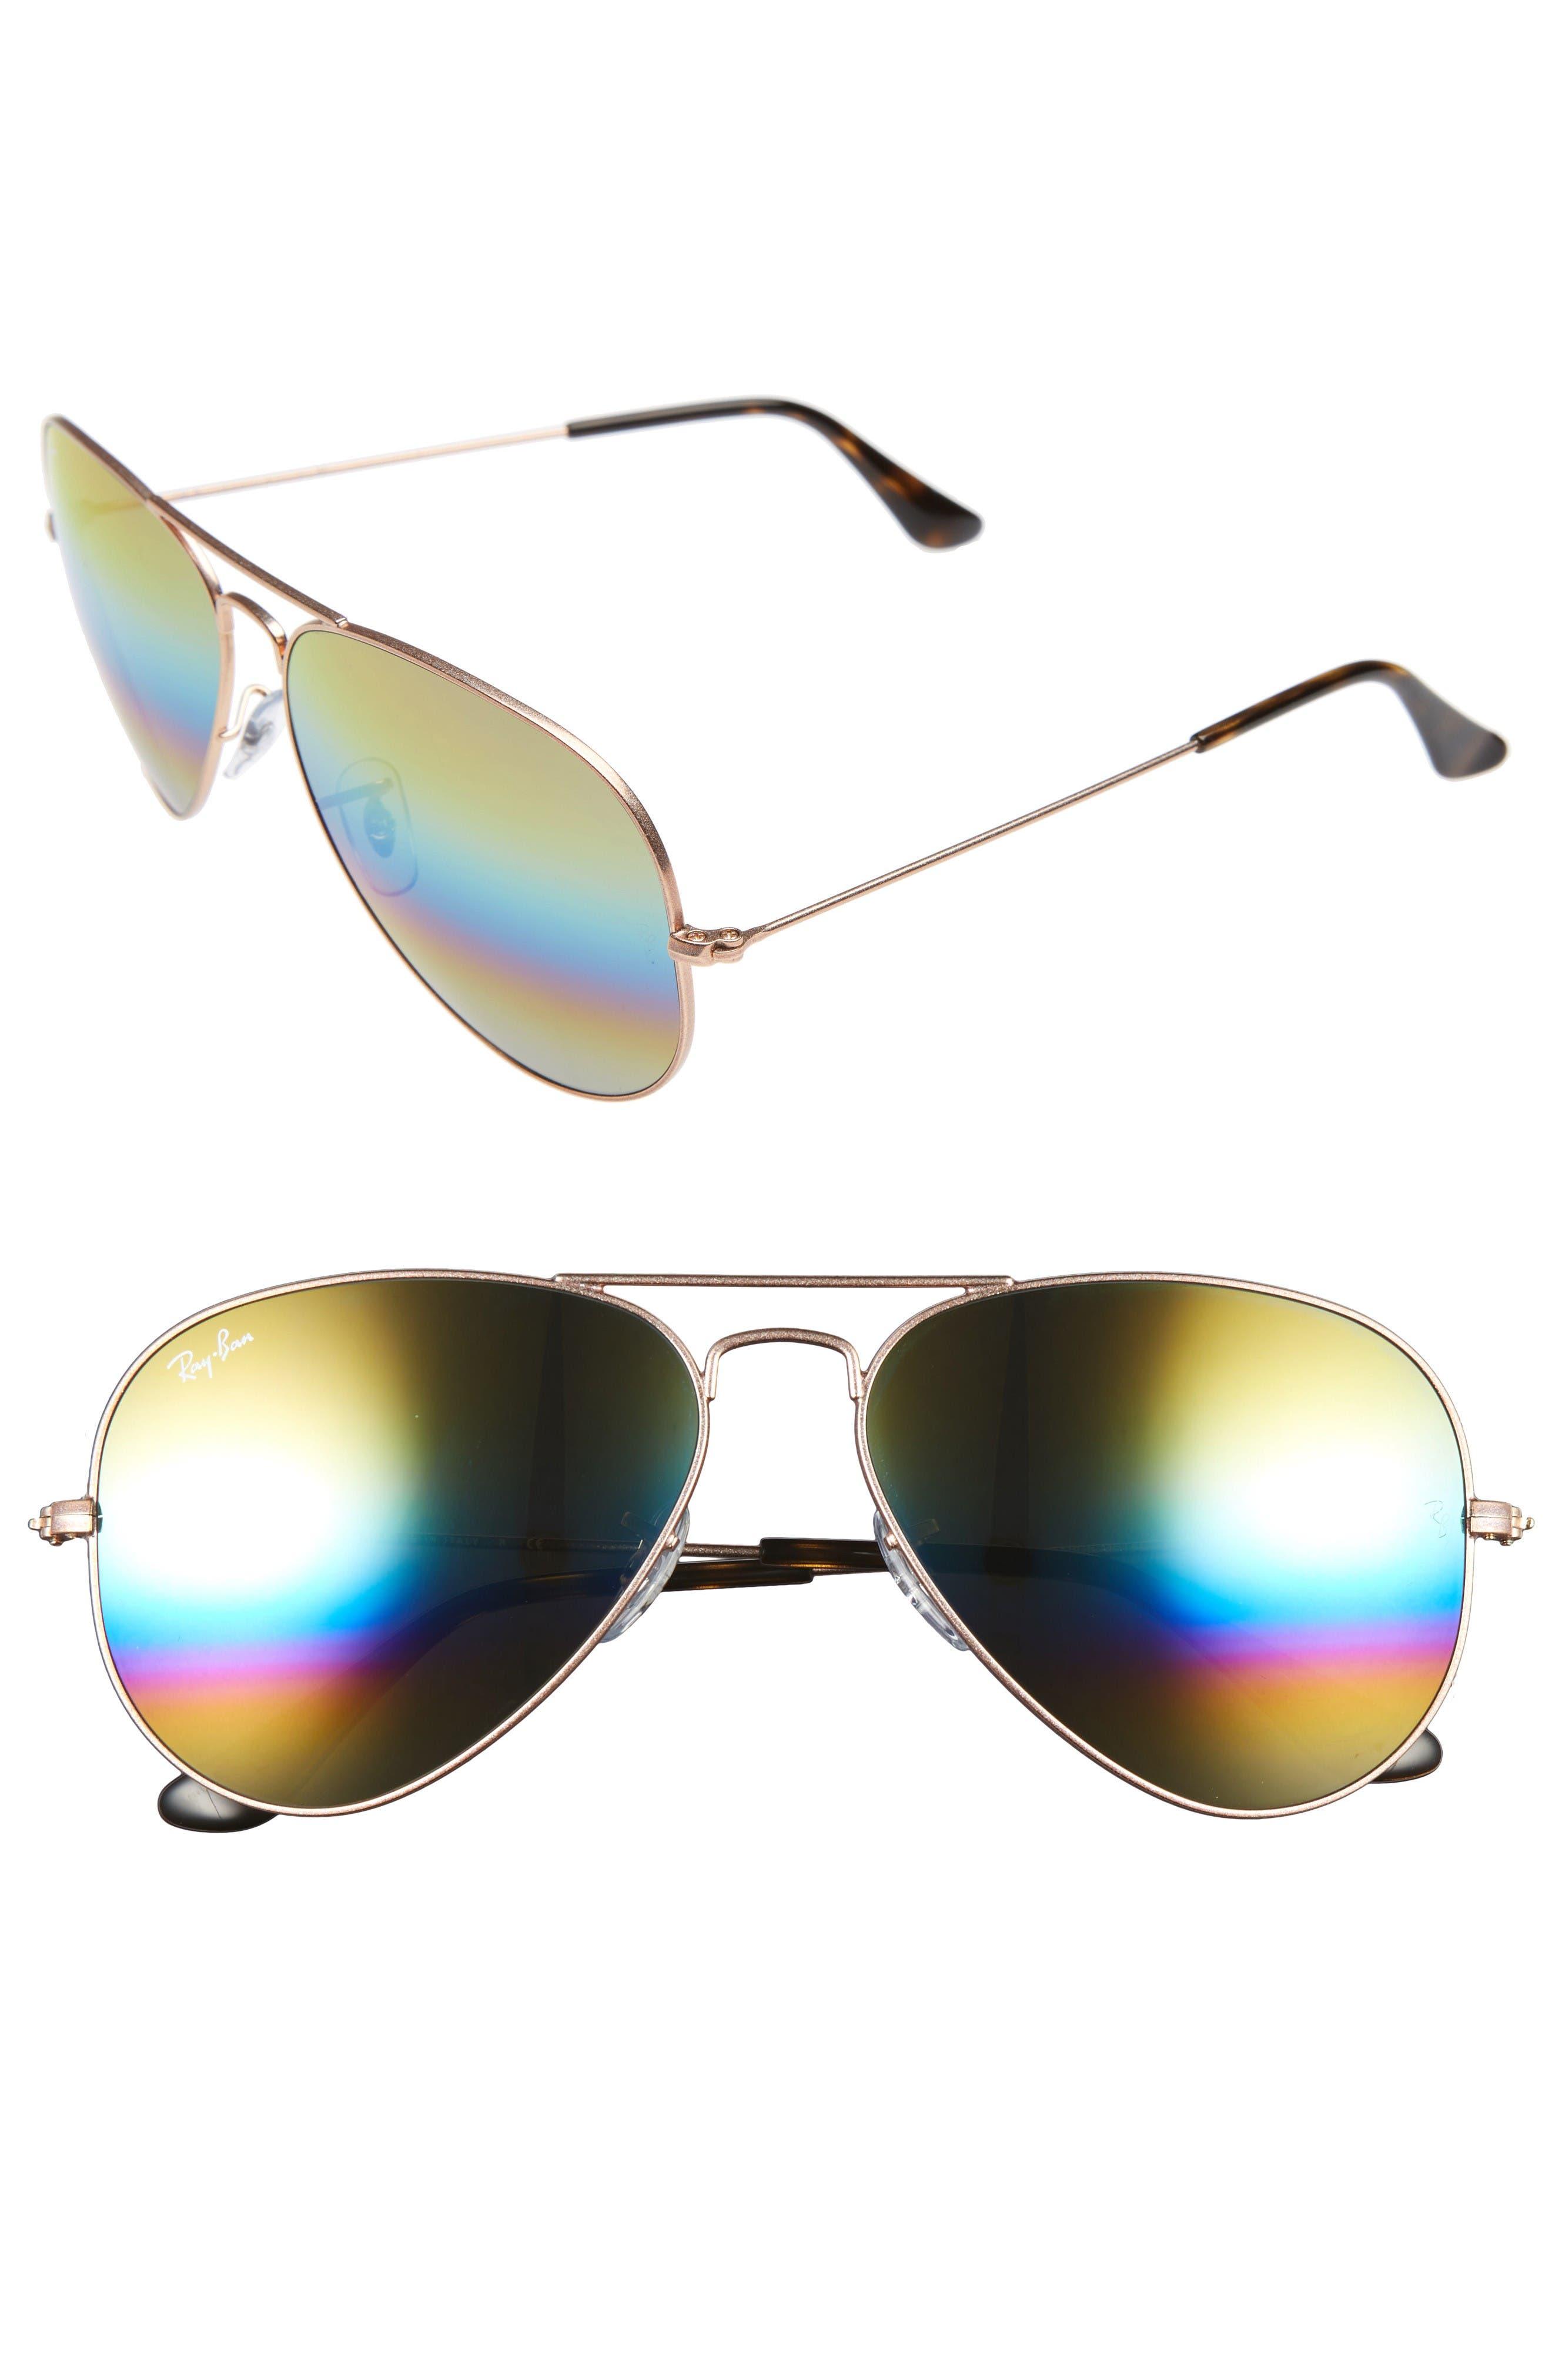 Main Image - Ray-Ban Large Icons 62mm Aviator Sunglasses